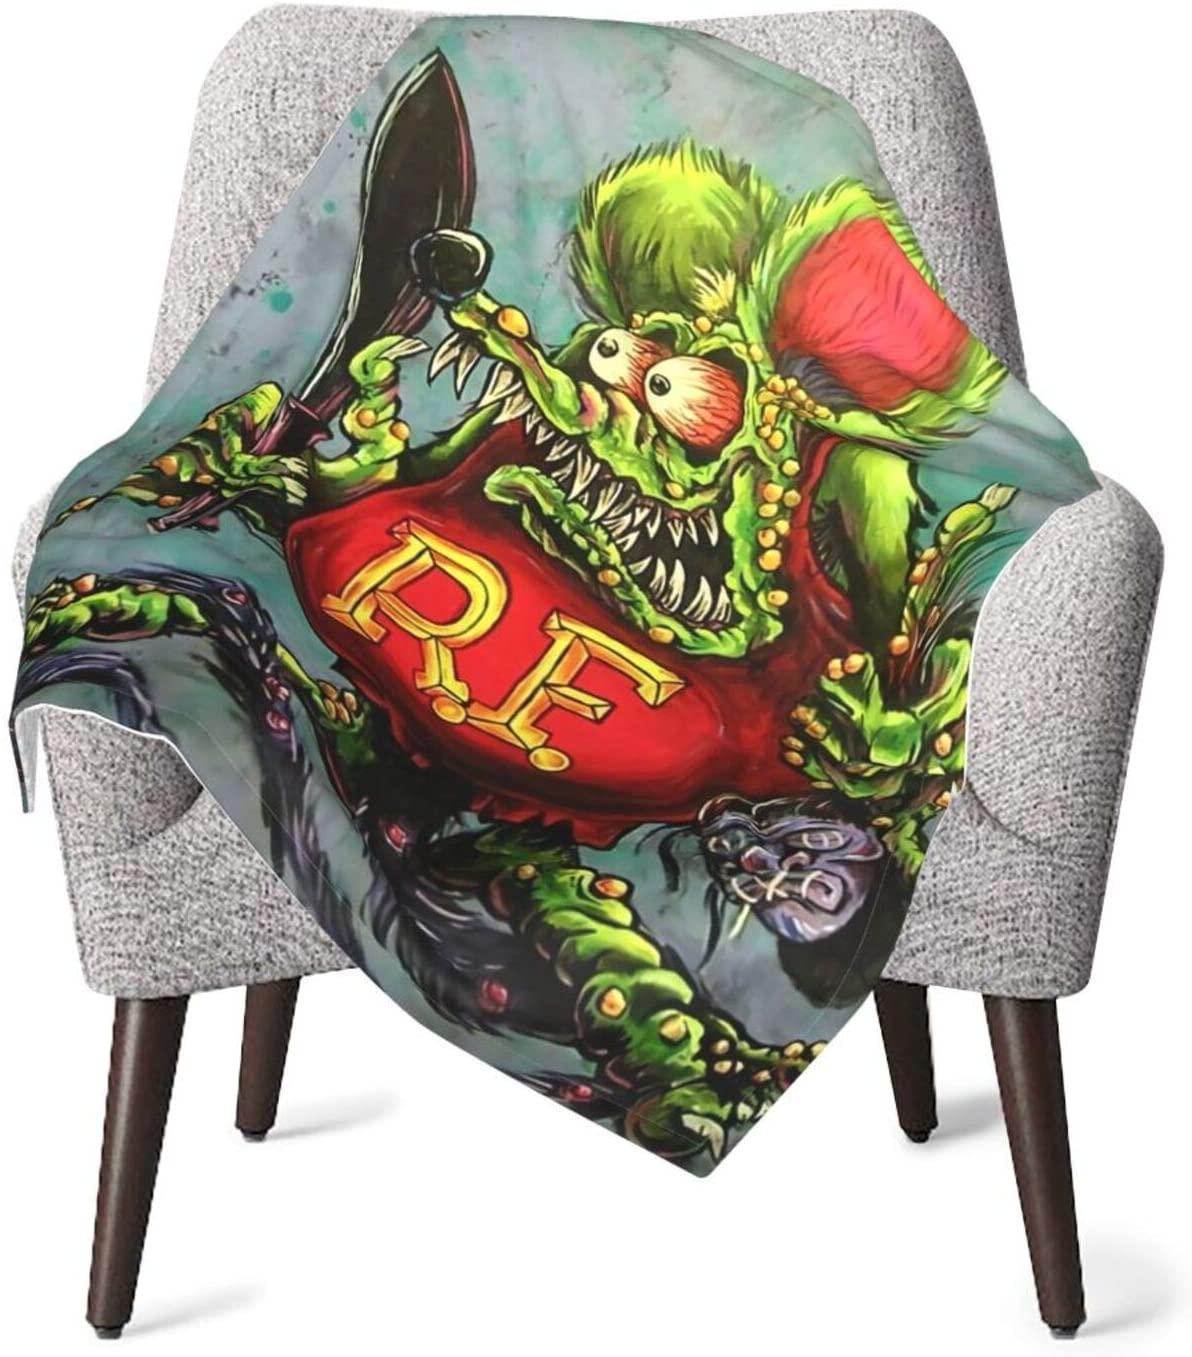 JimmyMilly Rat Fink Stylish Soft Warm Cozy Blanket Toddler Baby Comfort Blanket Lightweight Blanket Fluffy Blanket for Travel 30x40in